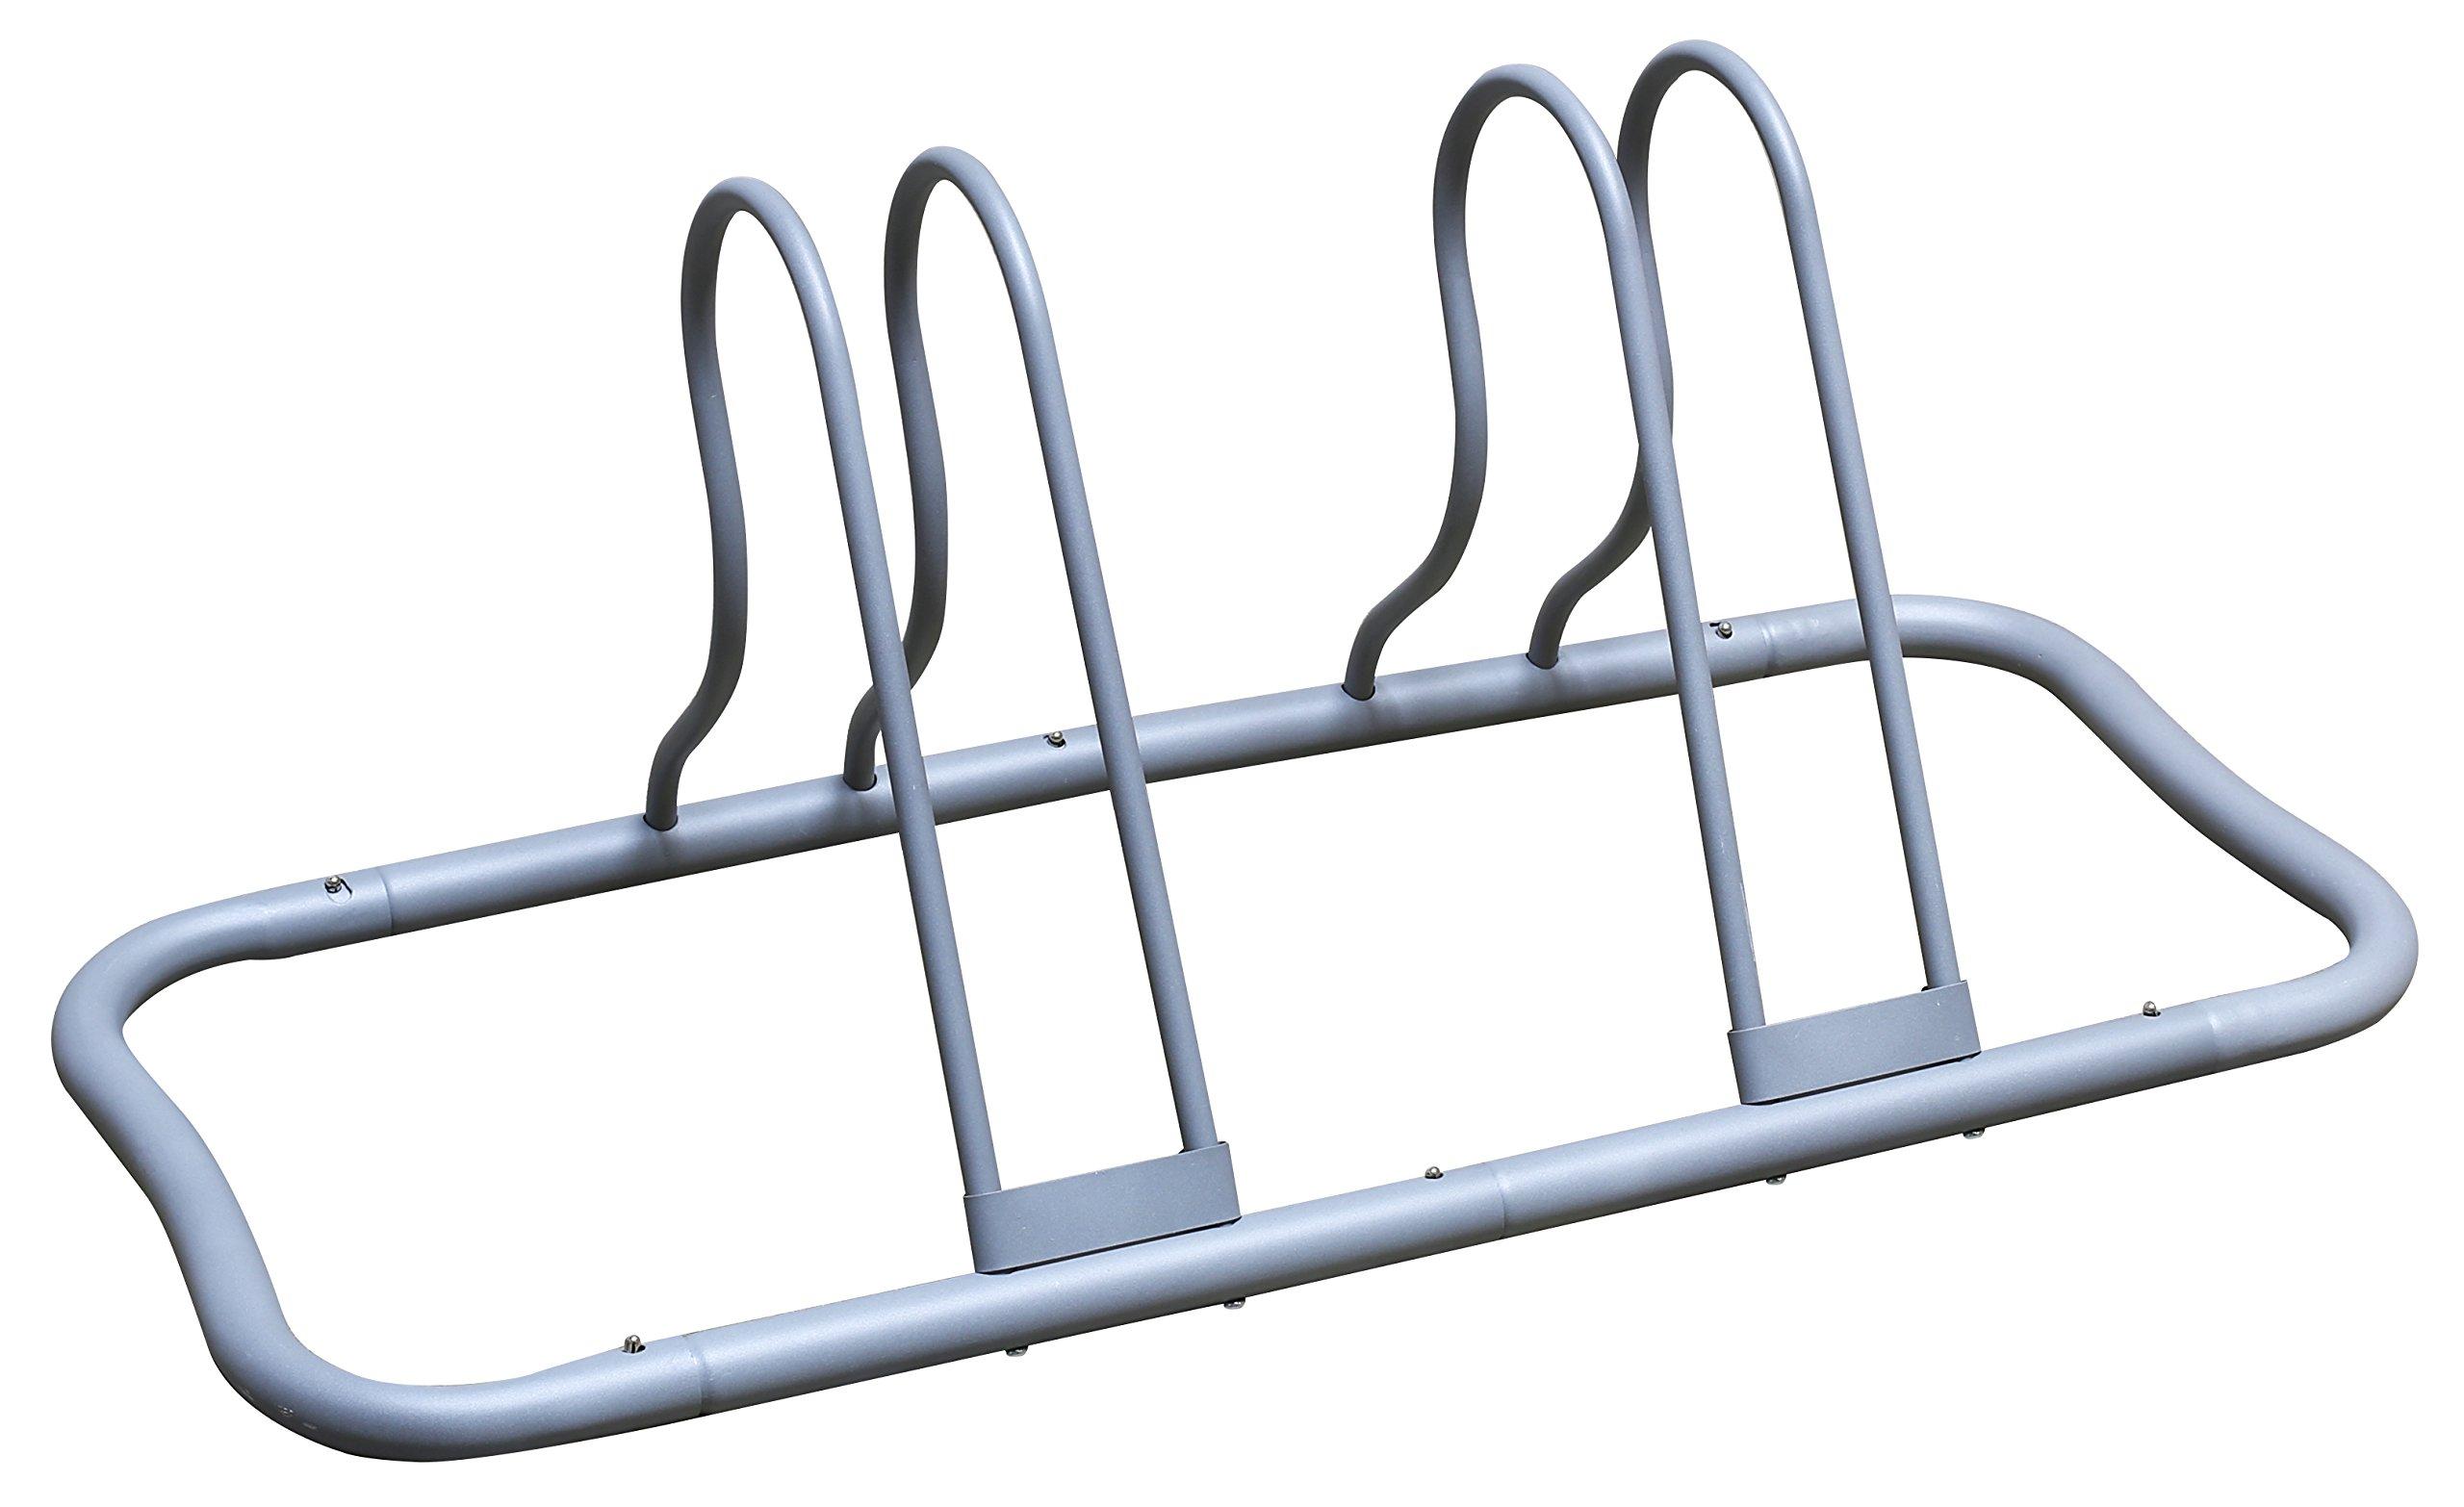 DecoBros 5 Bike Bicycle Floor Parking Adjustable Rack Storage Stand, Silver by Deco Brothers